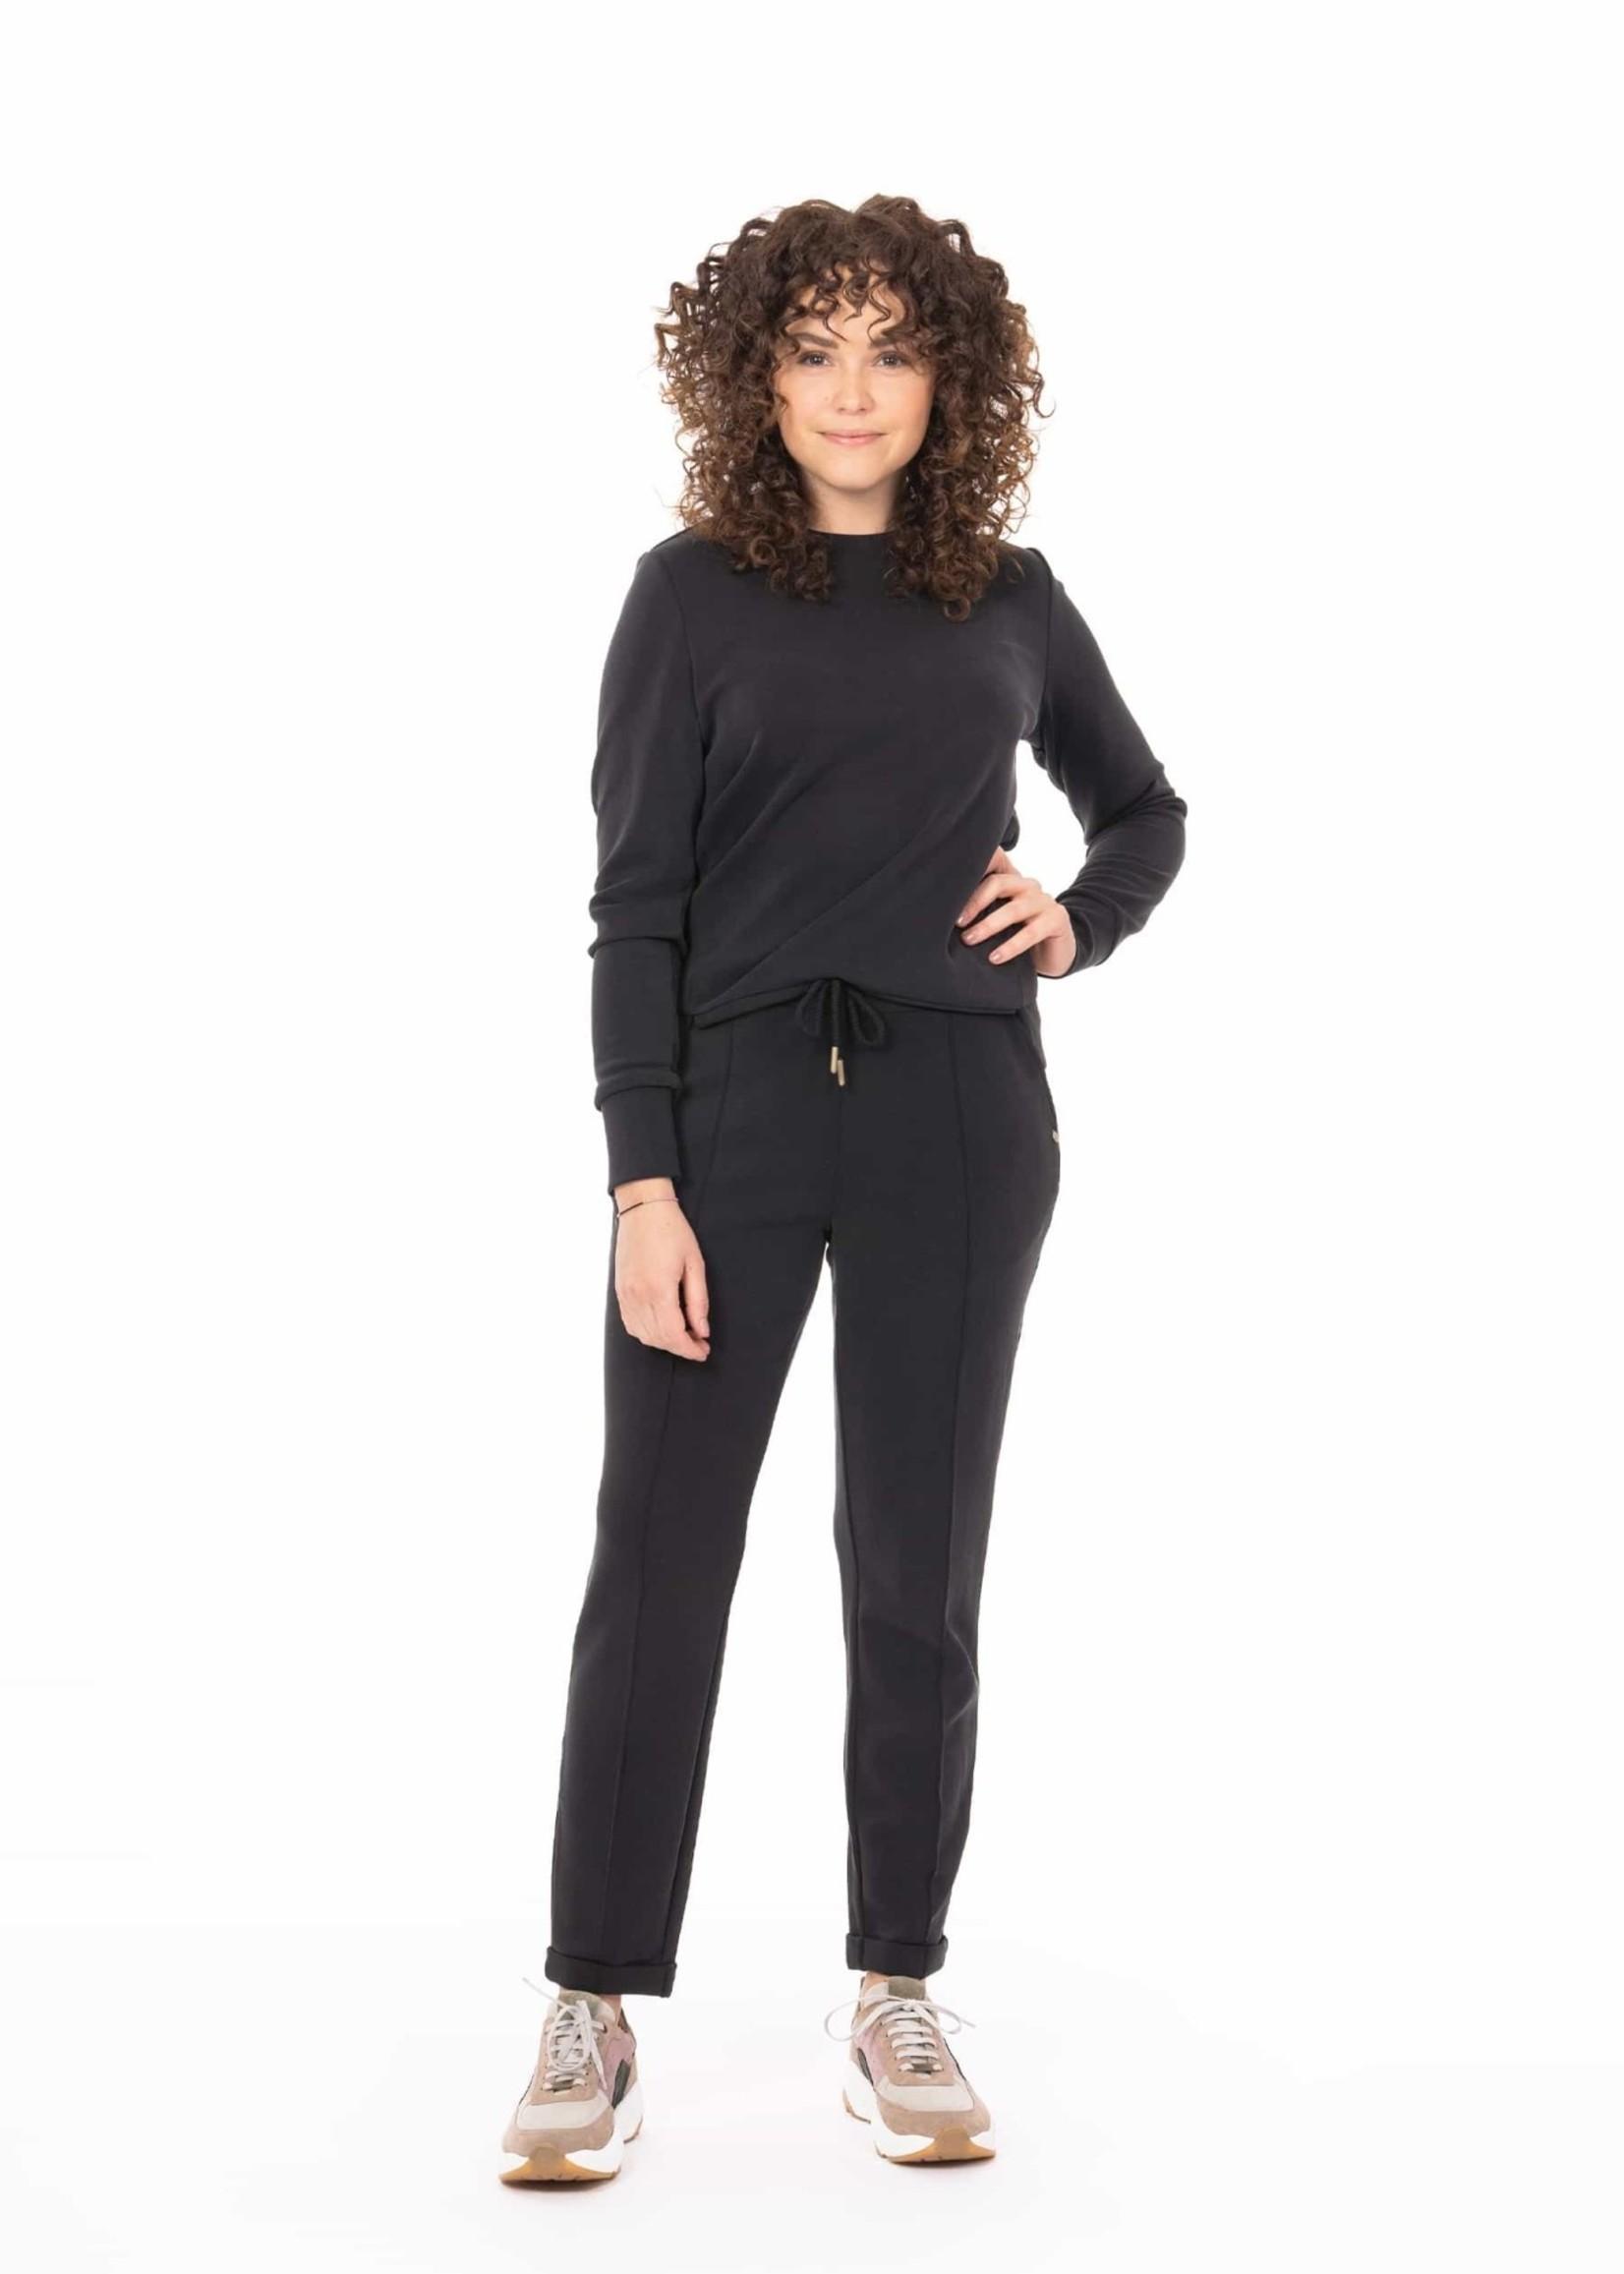 ZUSSS fijne sweater off-black